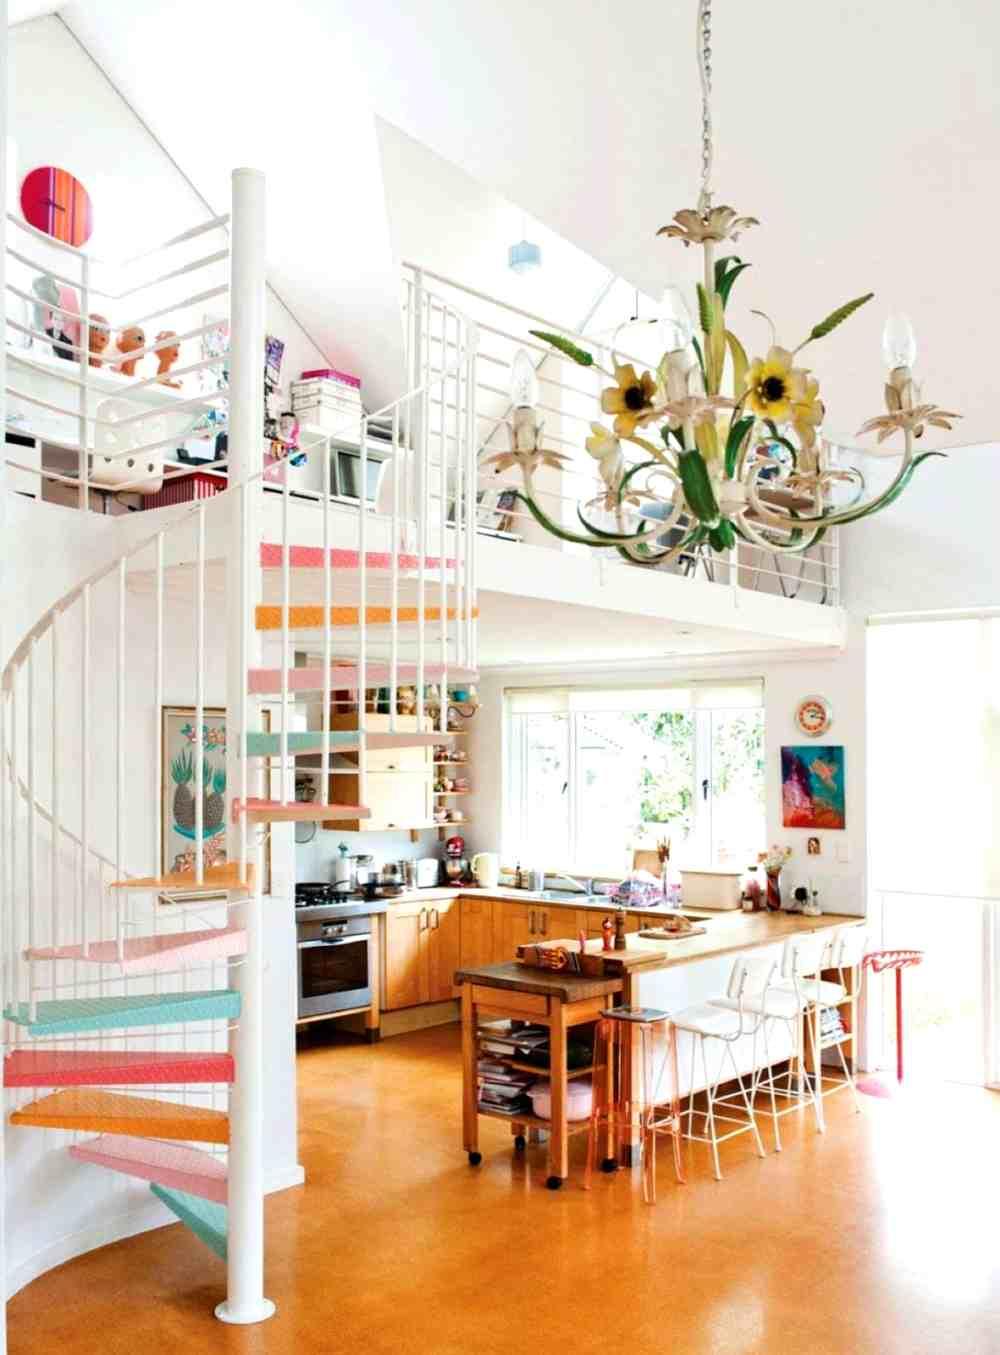 escalera original de color